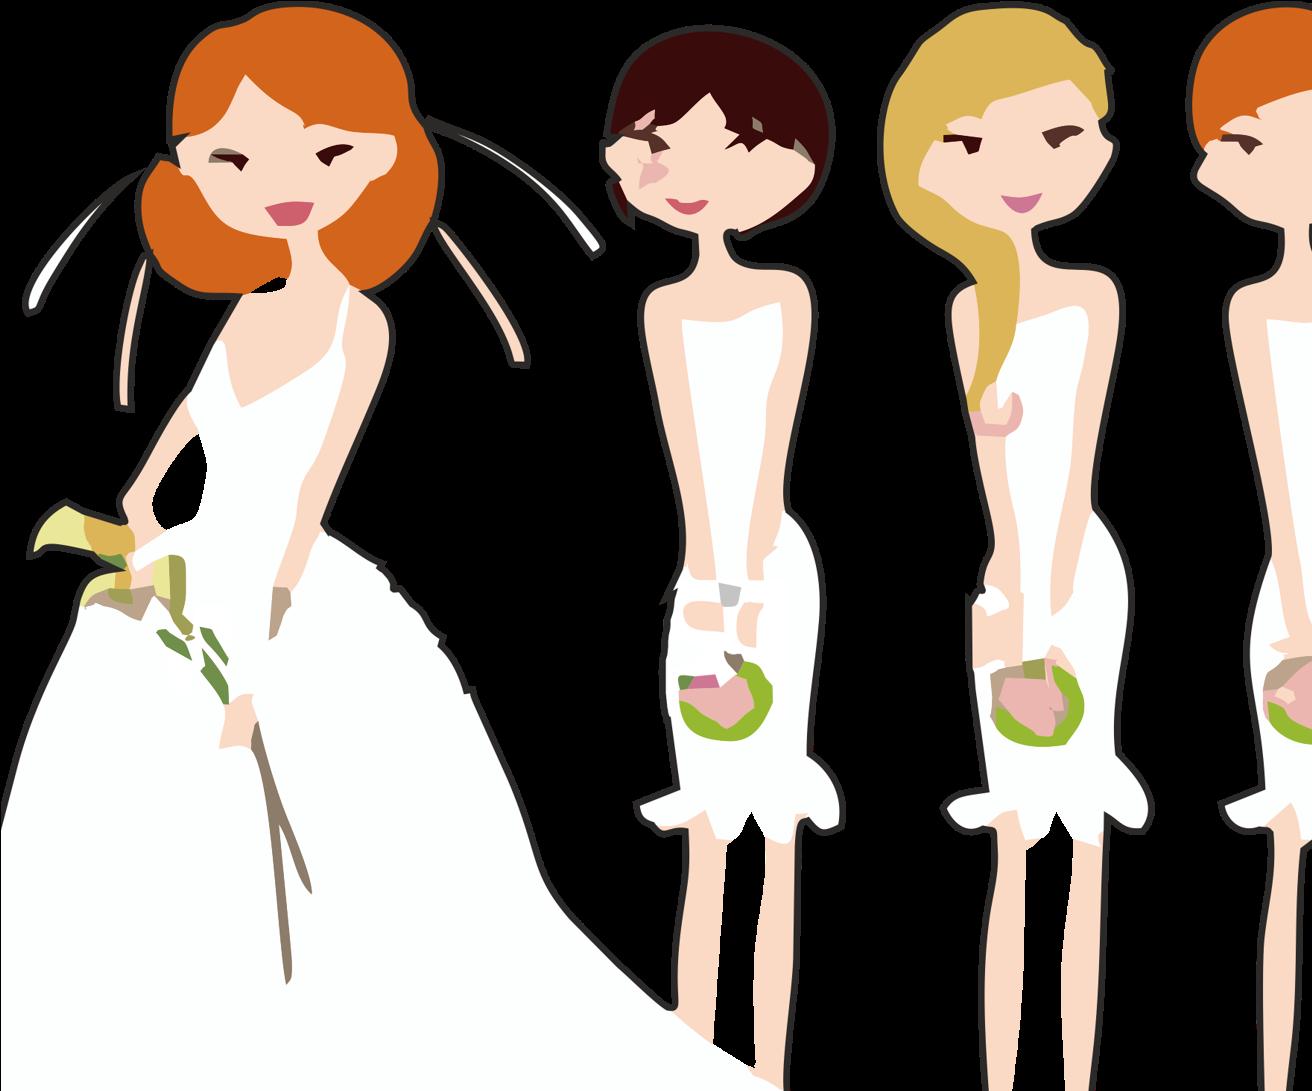 Bridesmaid clipart free png transparent HD Vector Freeuse Stock Bride And Bridesmaid Clipart - Bride And 3 ... png transparent